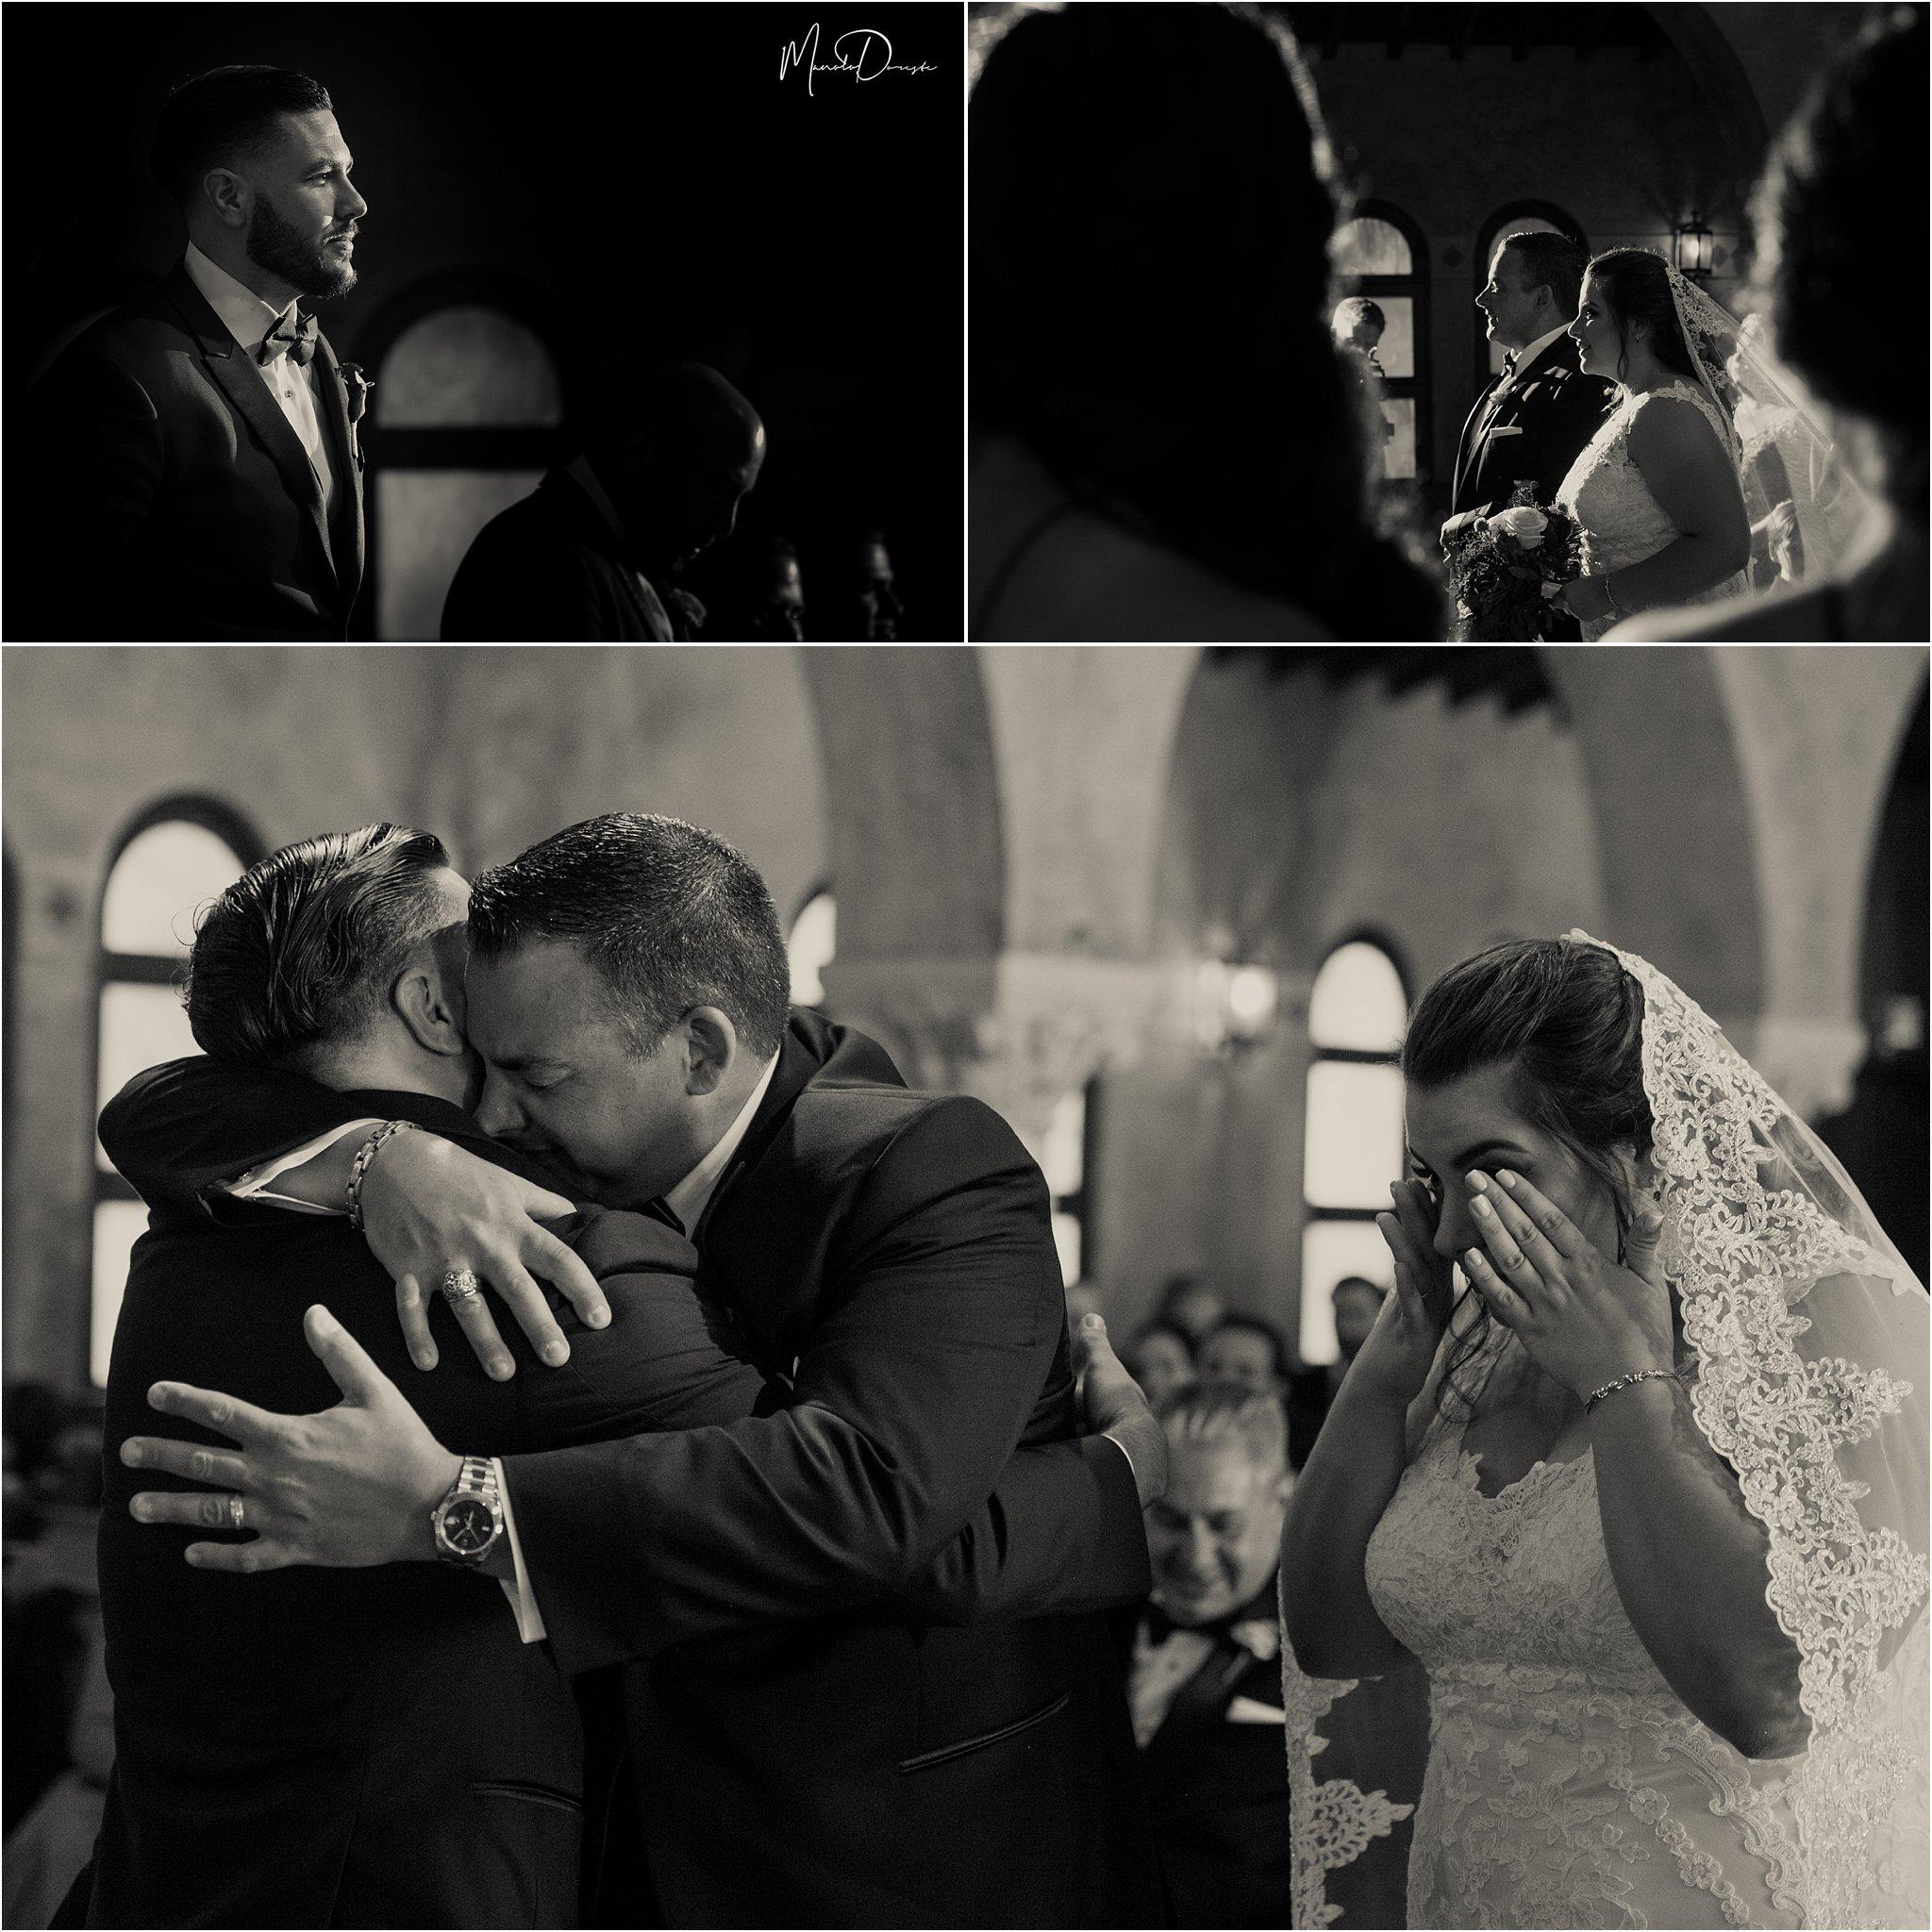 0365_ManoloDoreste_InFocusStudios_Wedding_Family_Photography_Miami_MiamiPhotographer.jpg